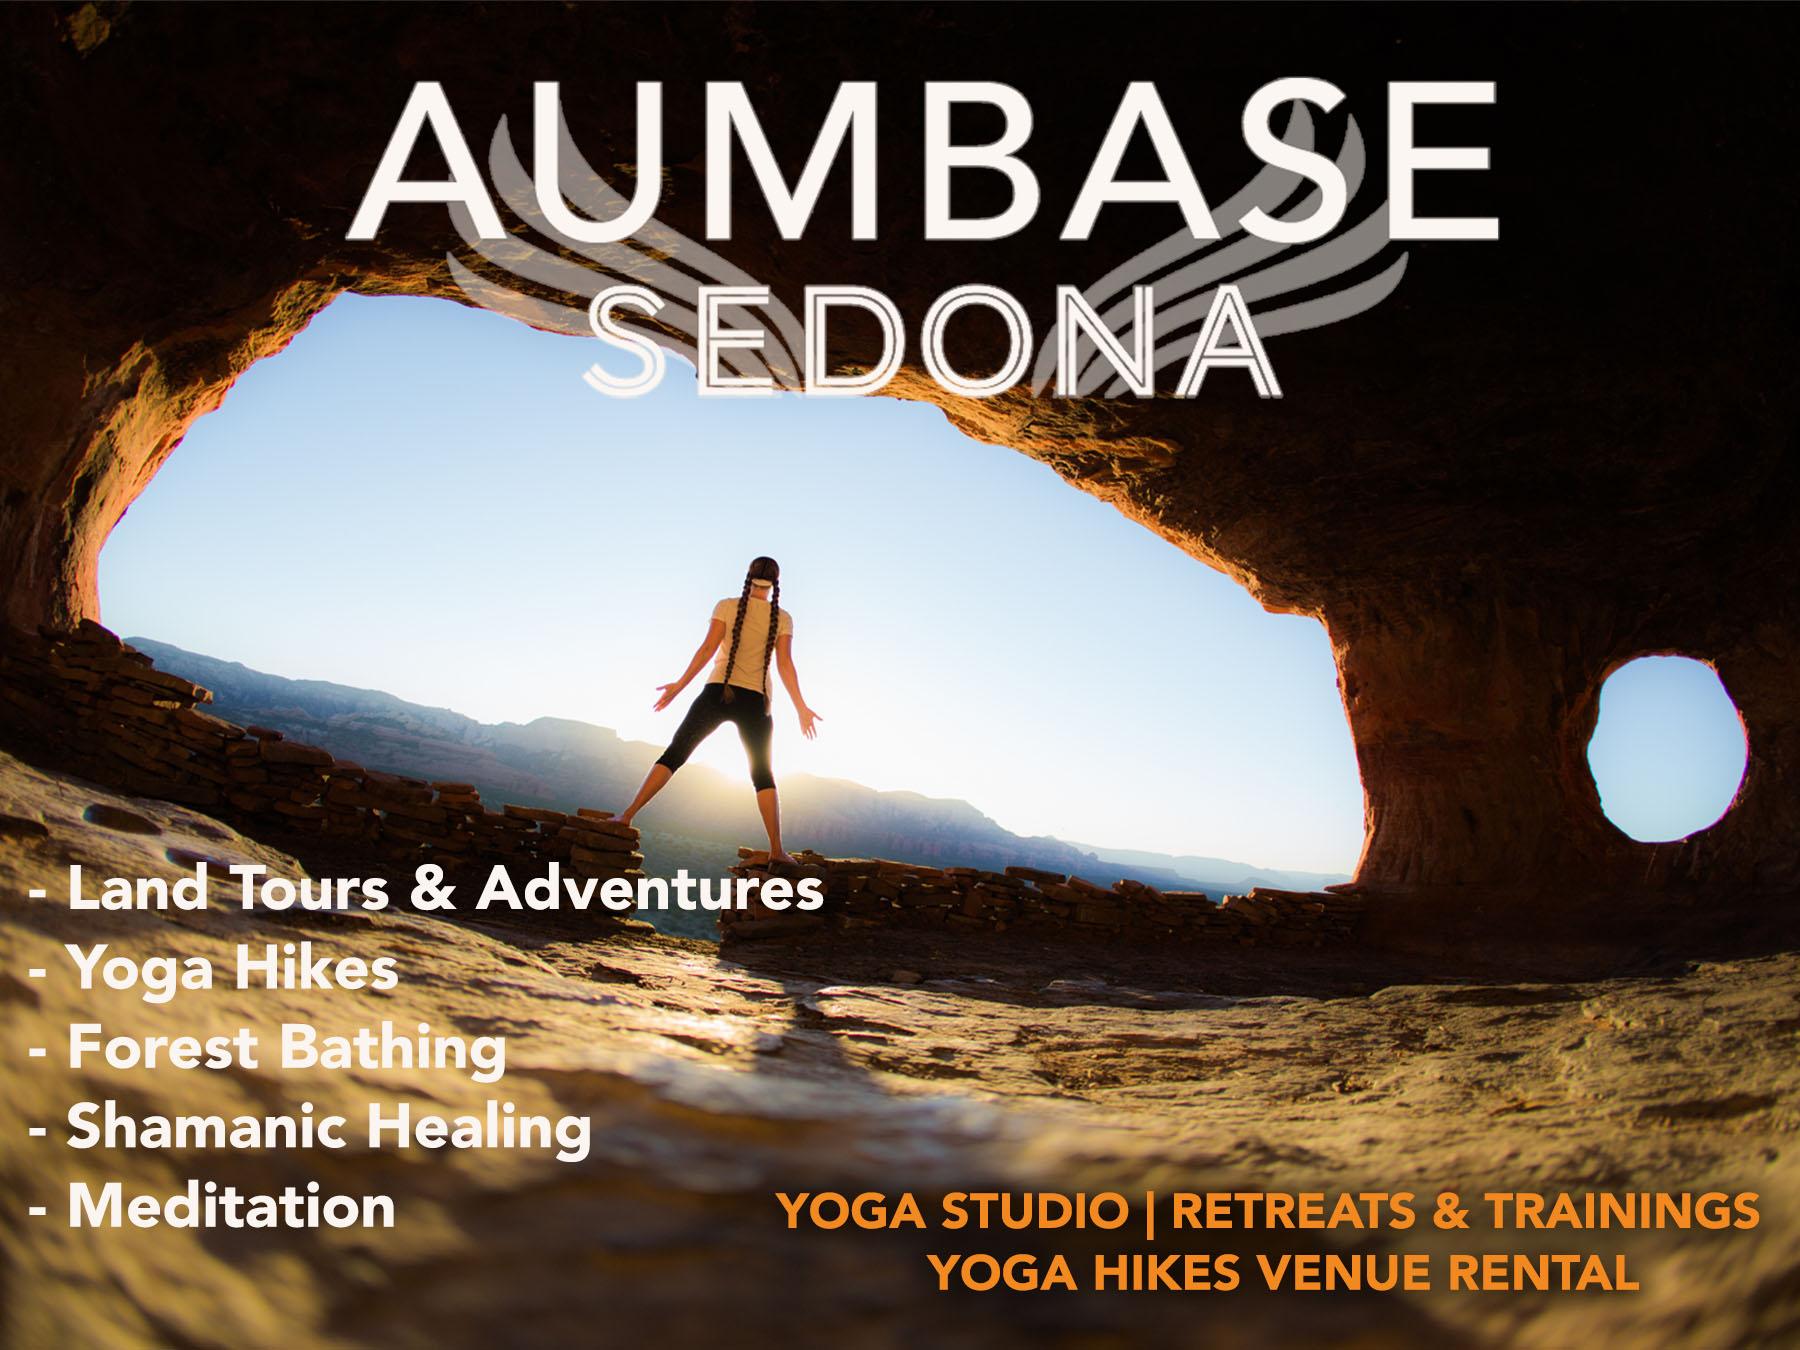 Sedona Yoga Studio